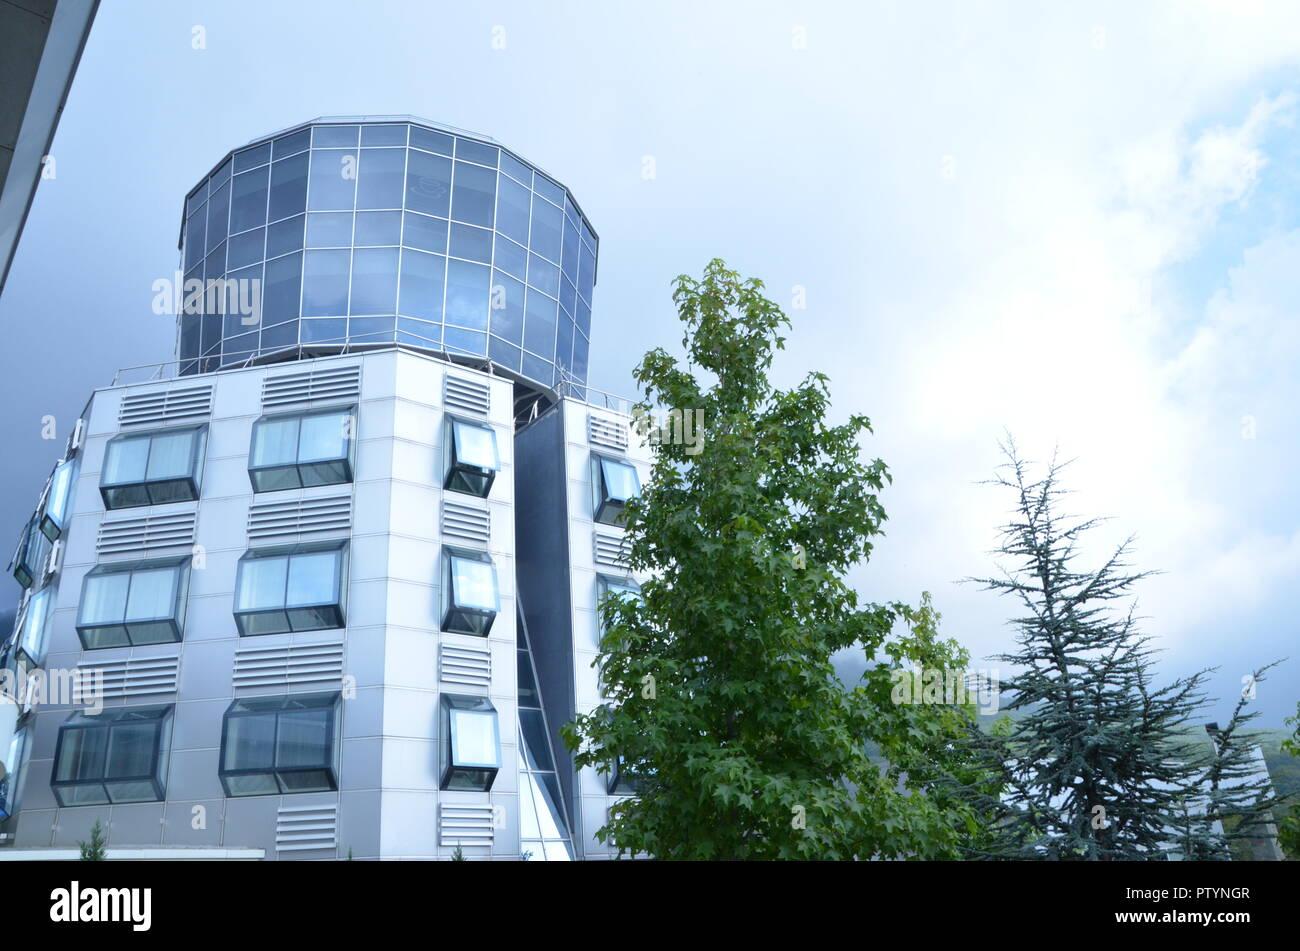 dajti tower hotel tirana albania - Stock Image